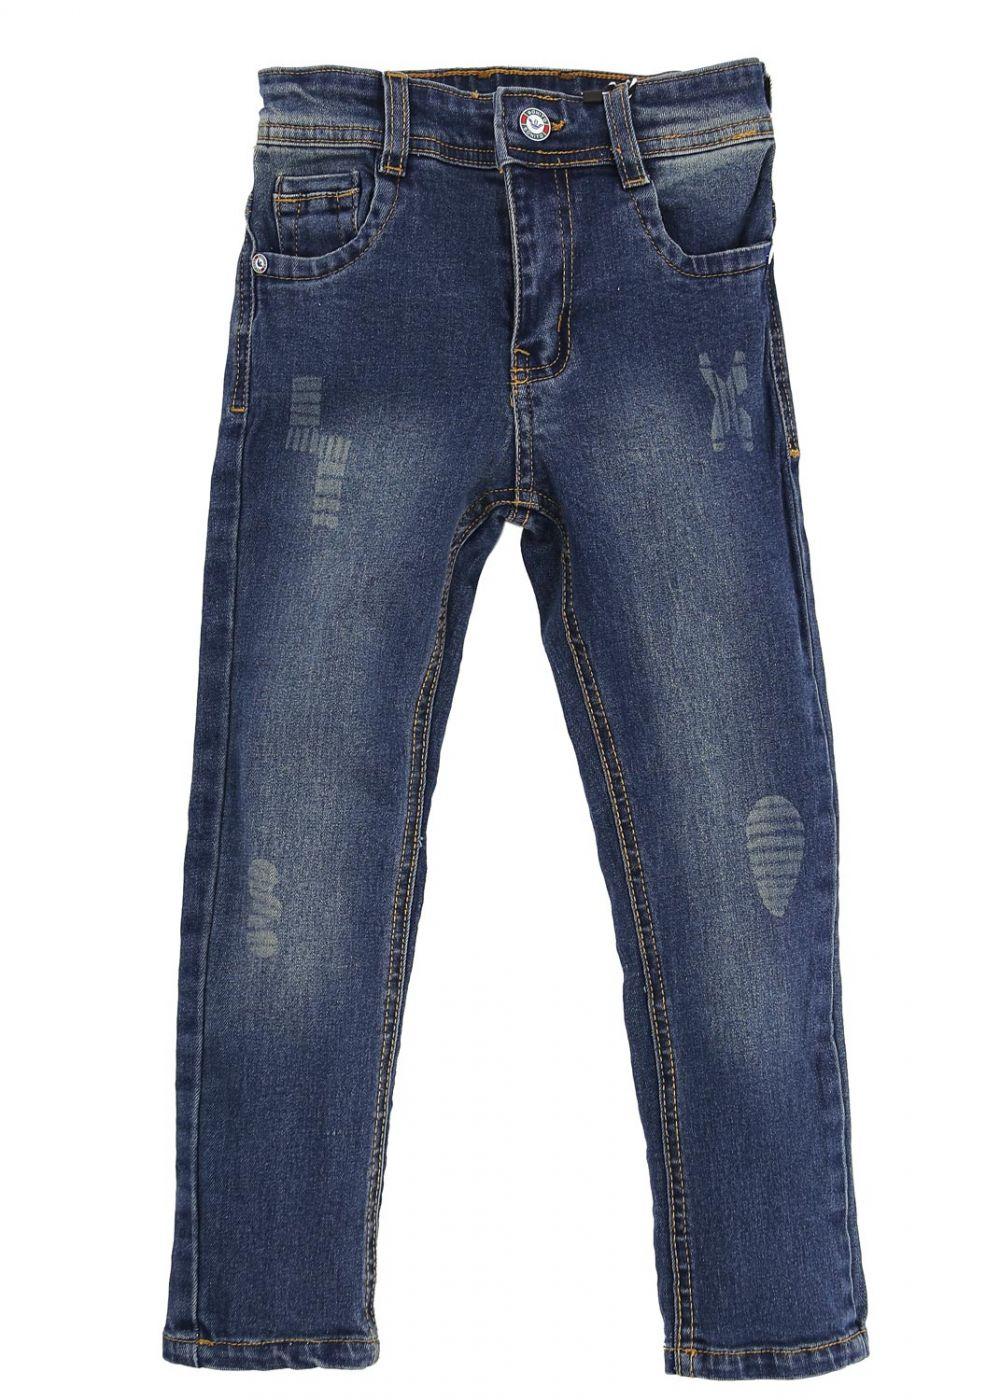 Джинсы для мальчика Bonito Jeans Style